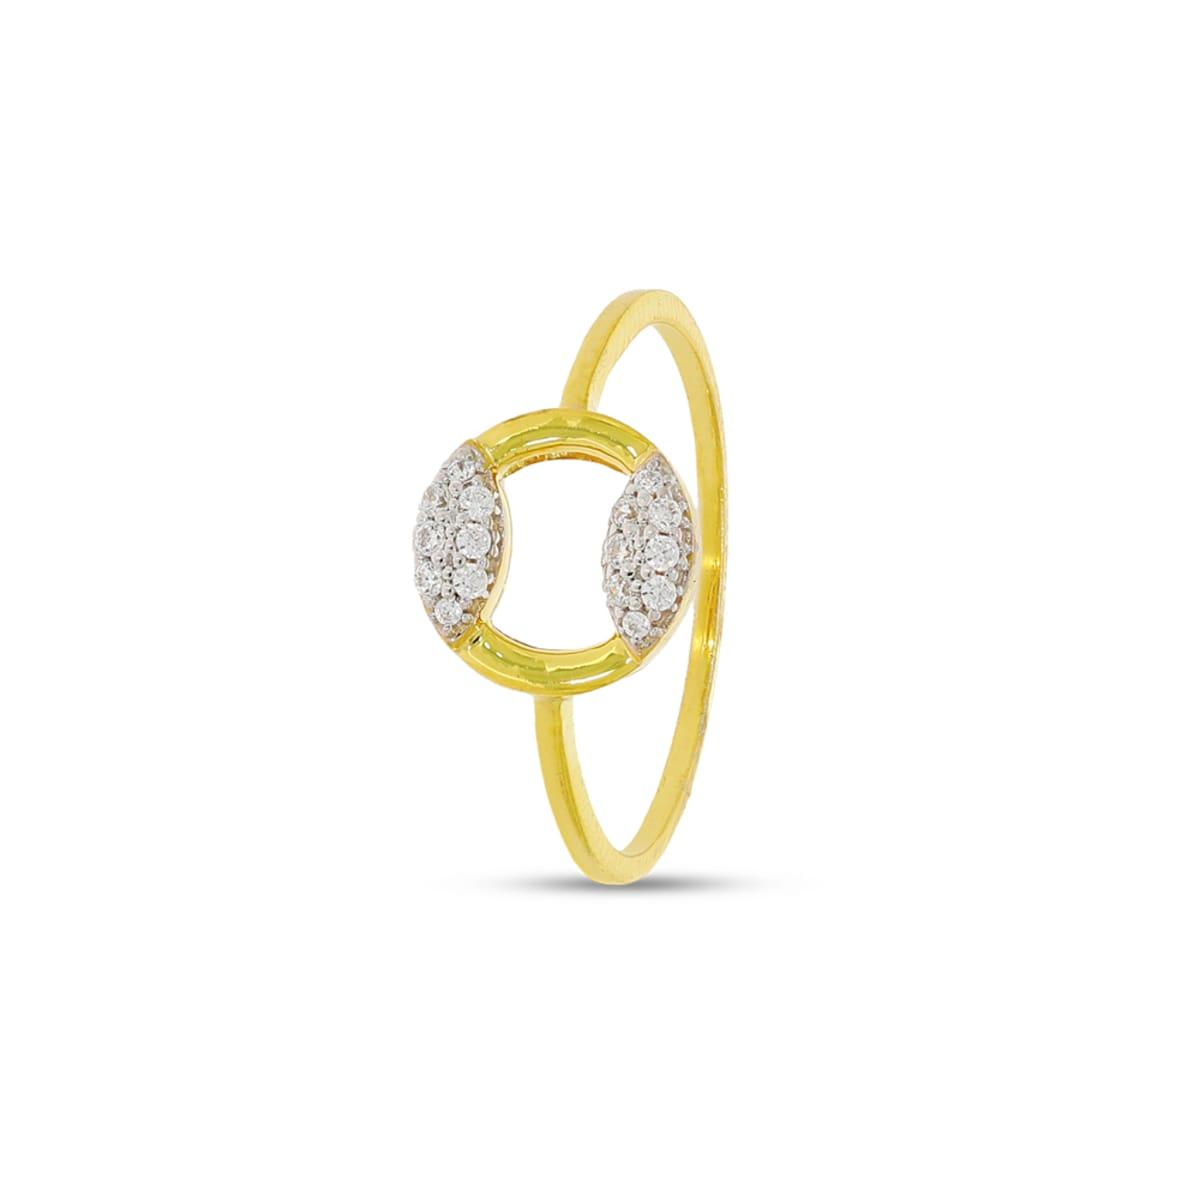 16 Pcs Real Diamond Ring